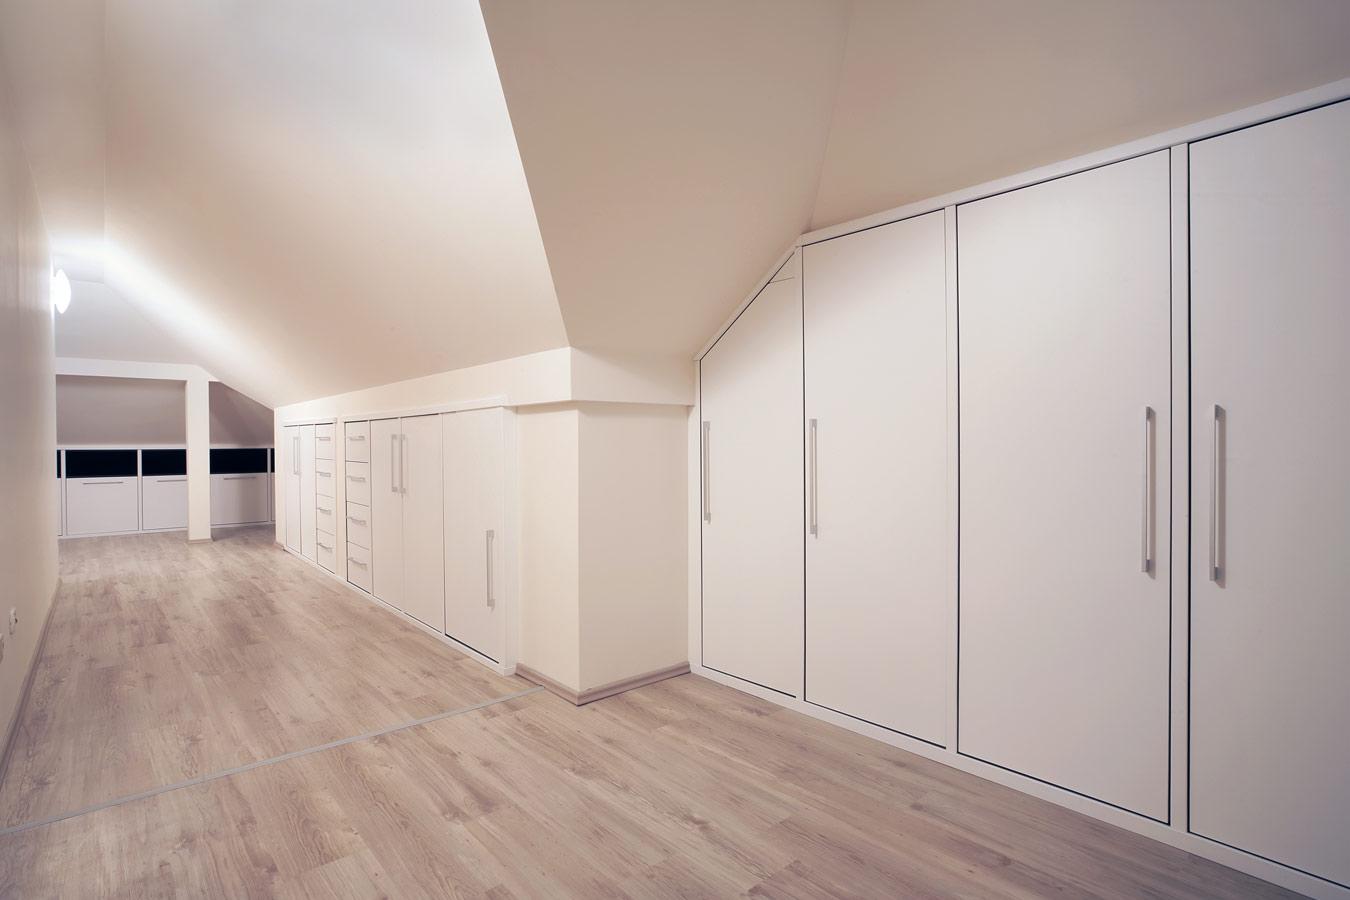 Wand slaapkamer - Grijze slaapkamer ...